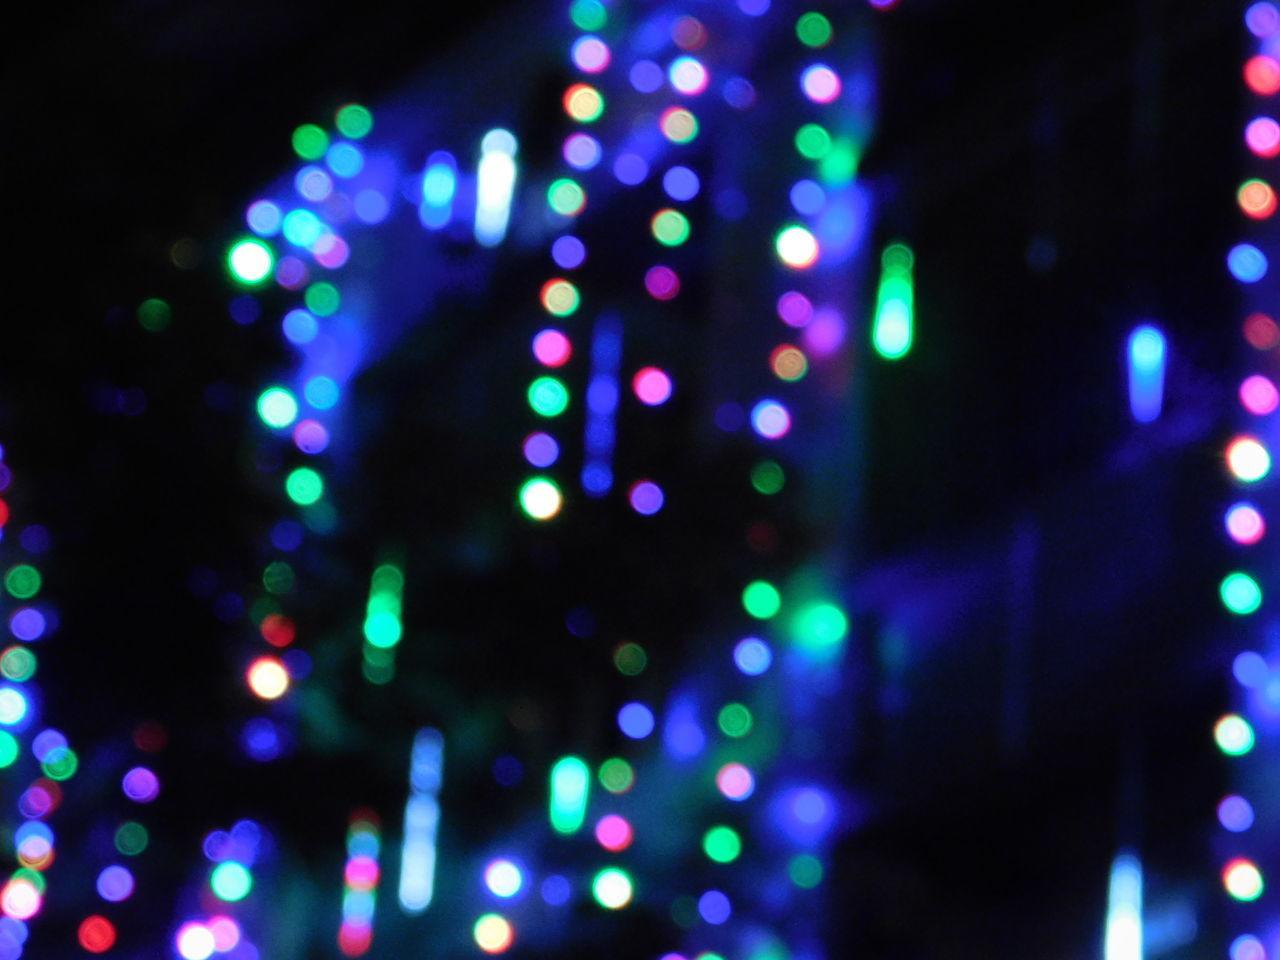 illuminated, defocused, night, lighting equipment, multi colored, glowing, pattern, no people, decoration, light, lens flare, light - natural phenomenon, celebration, electricity, technology, christmas decoration, electric light, christmas lights, christmas, abstract, nightlife